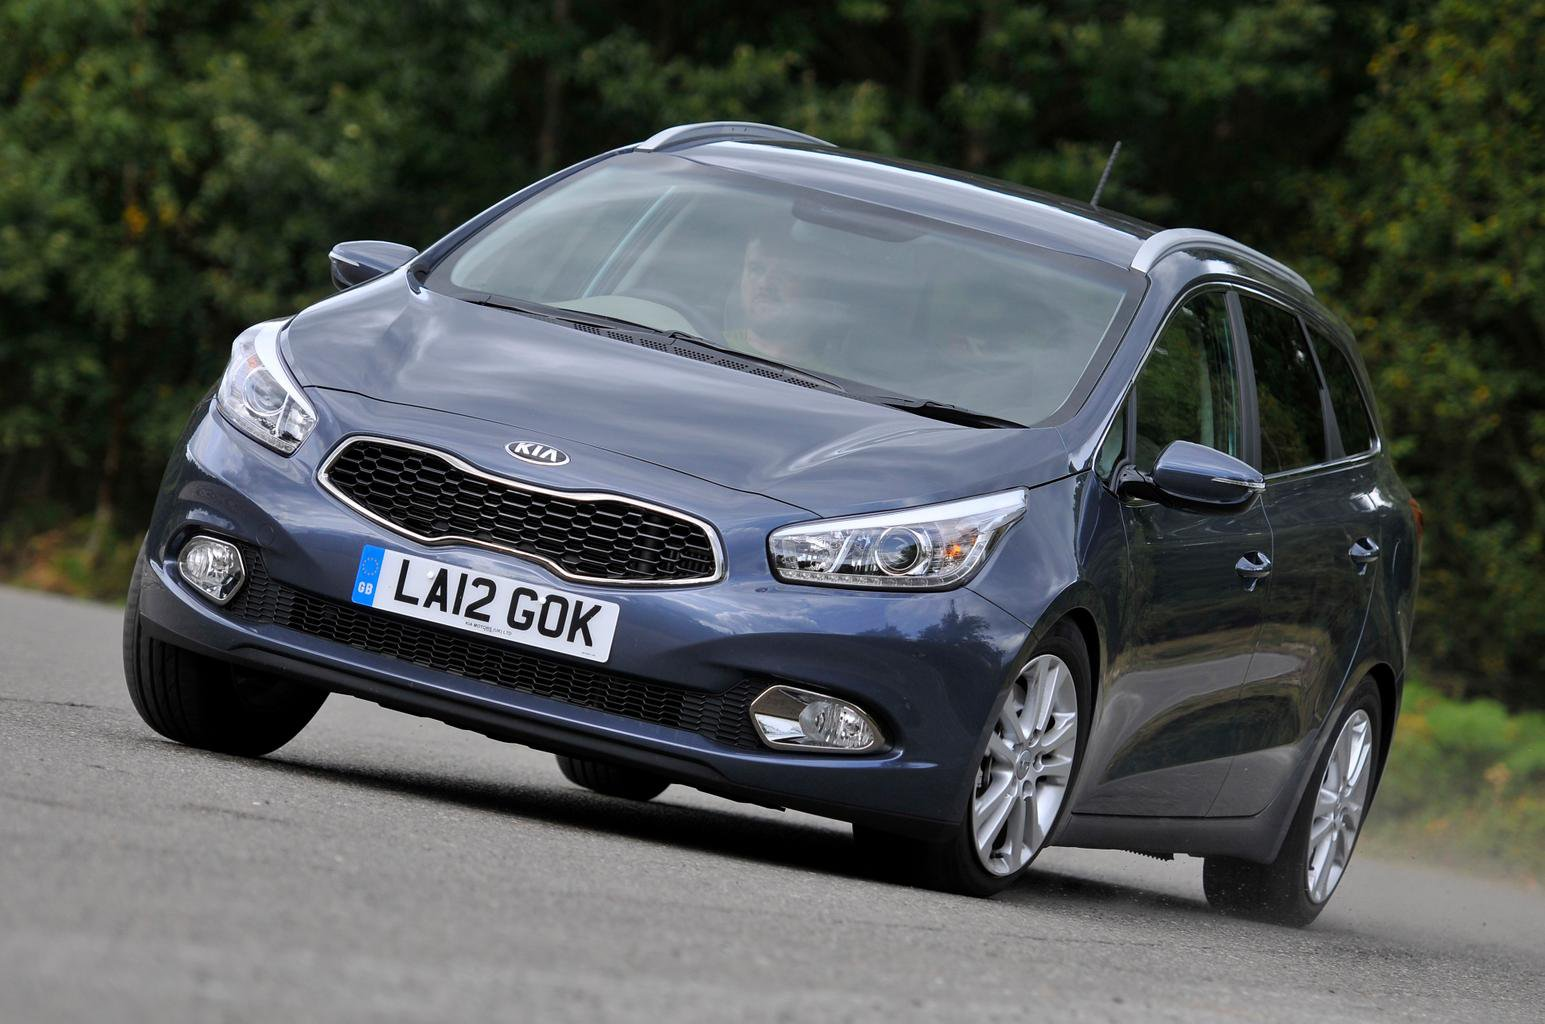 Used test: Ford Focus Estate vs Kia Cee'd Sportswagon vs Chevrolet Cruze Station Wagon